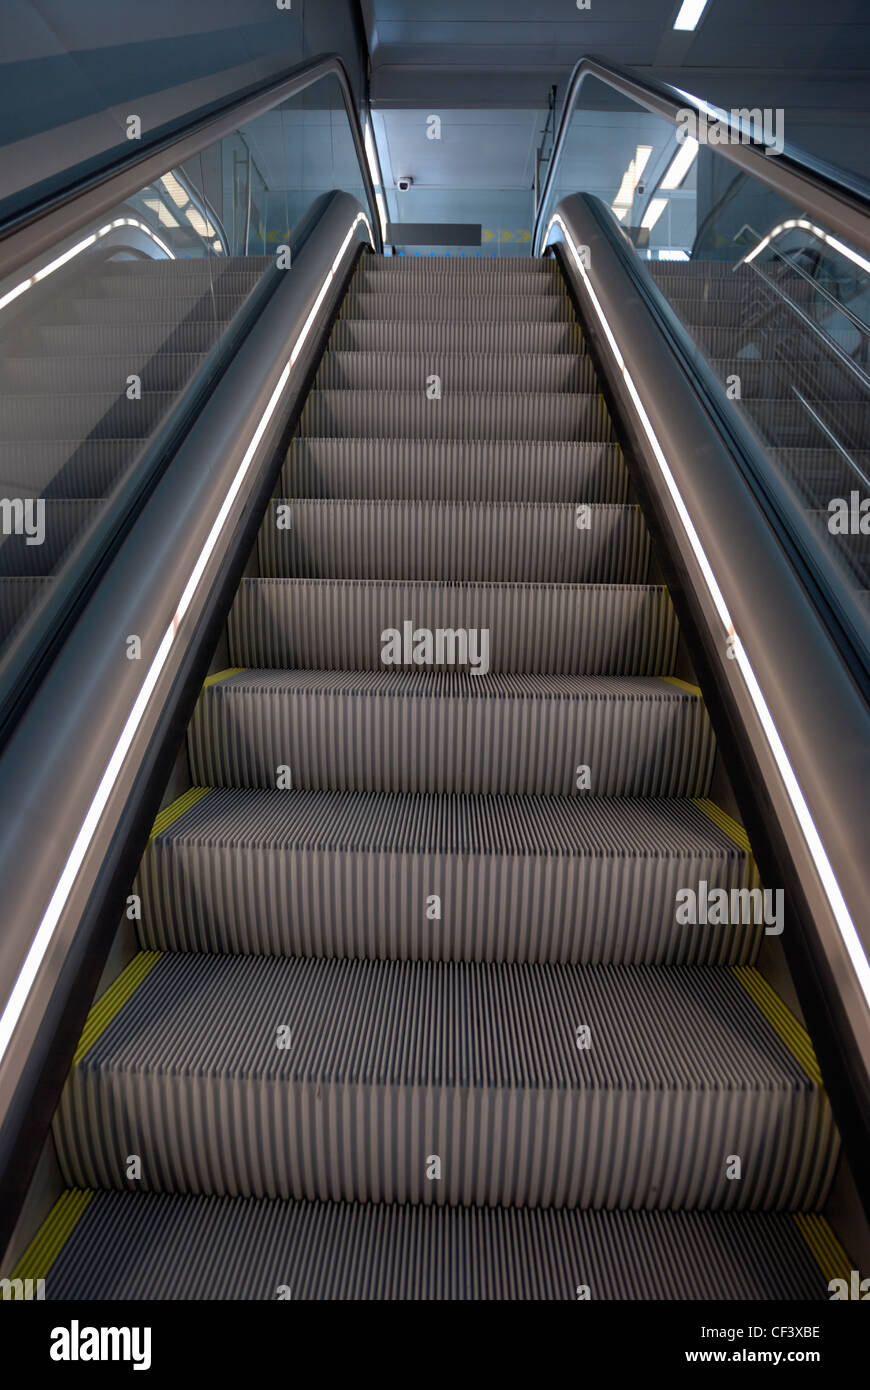 Looking up an escalator - Stock Image